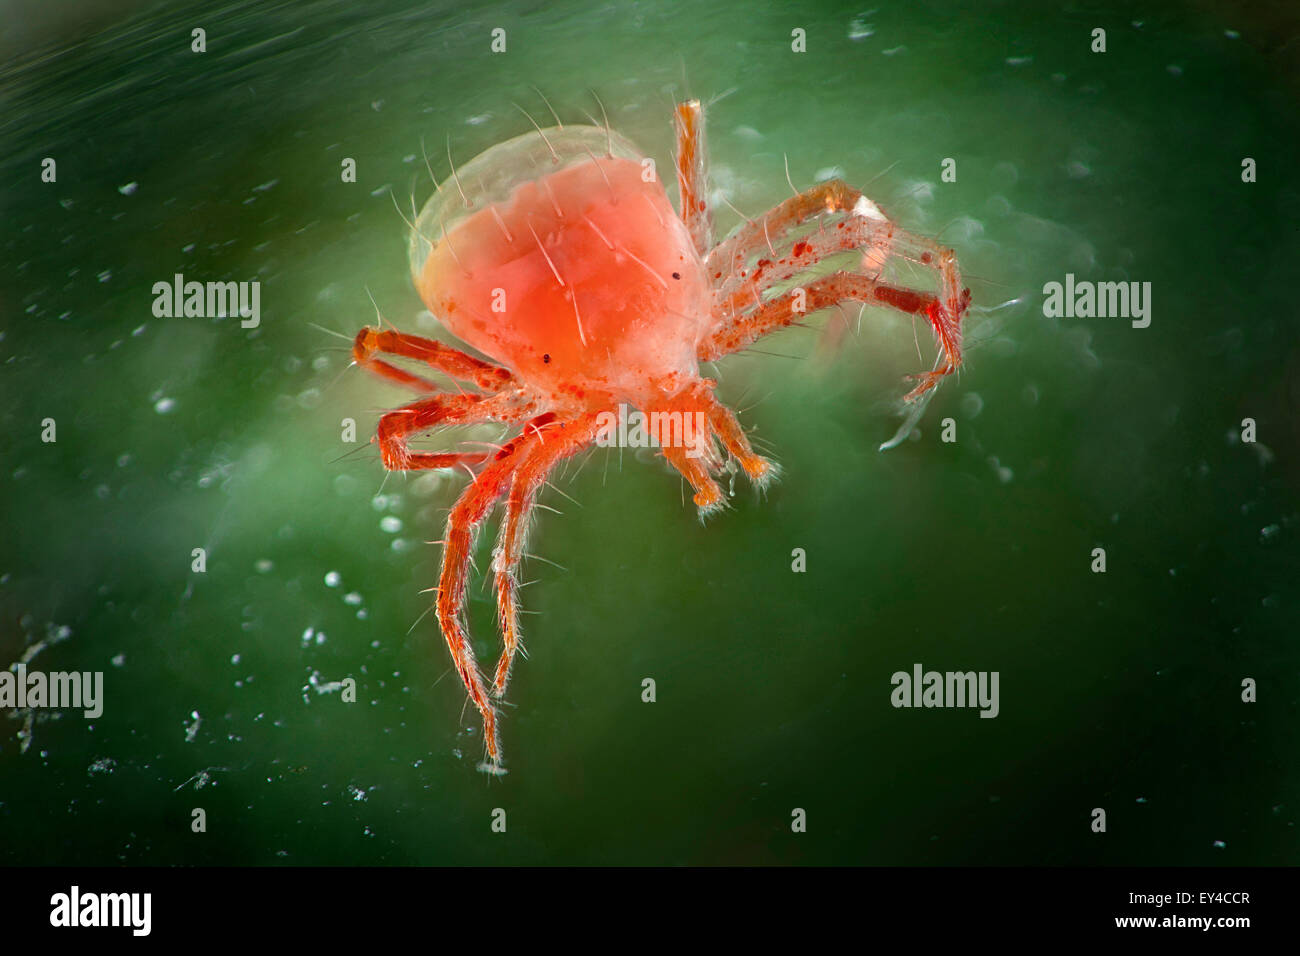 Whirligig Mite, Anystis baccarum - Stock Image